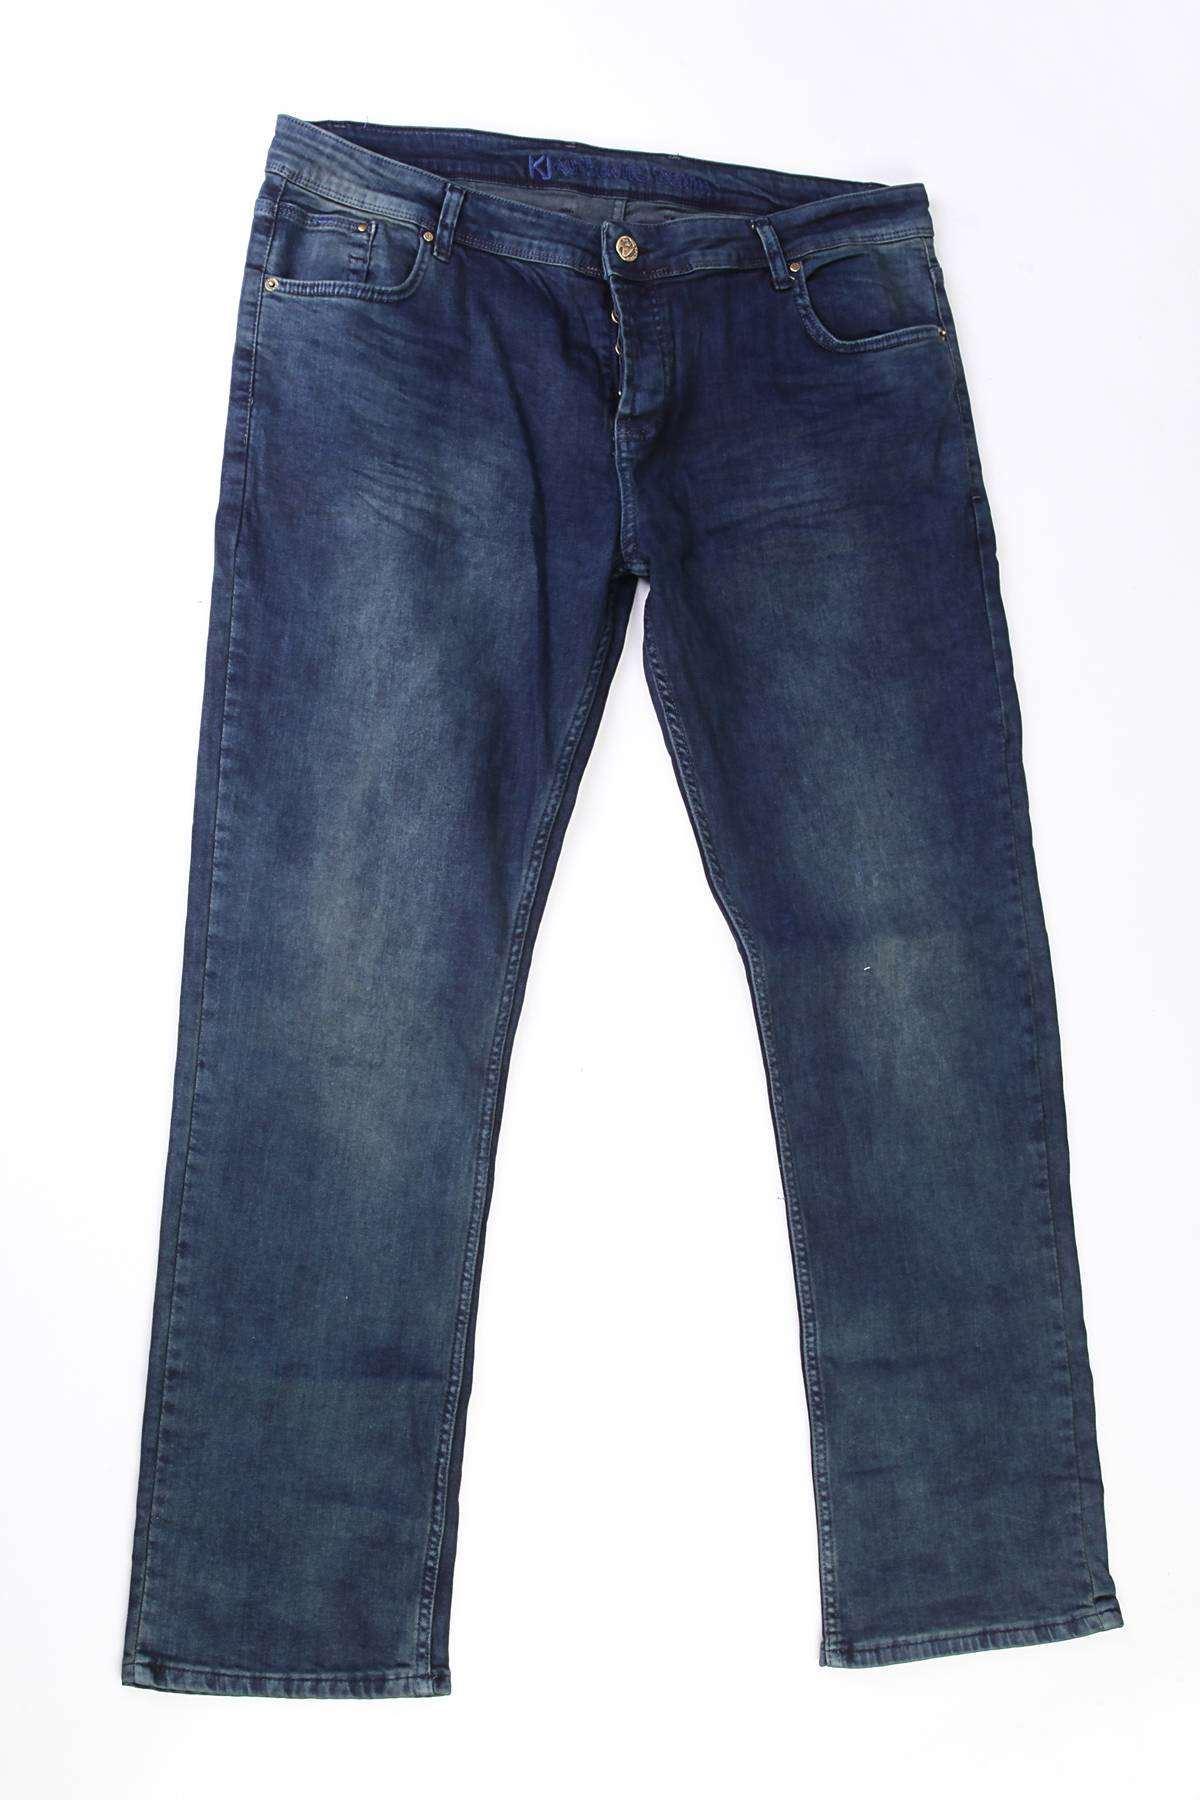 Basic Yıkamalı Battal Kot Pantolon Lacivert